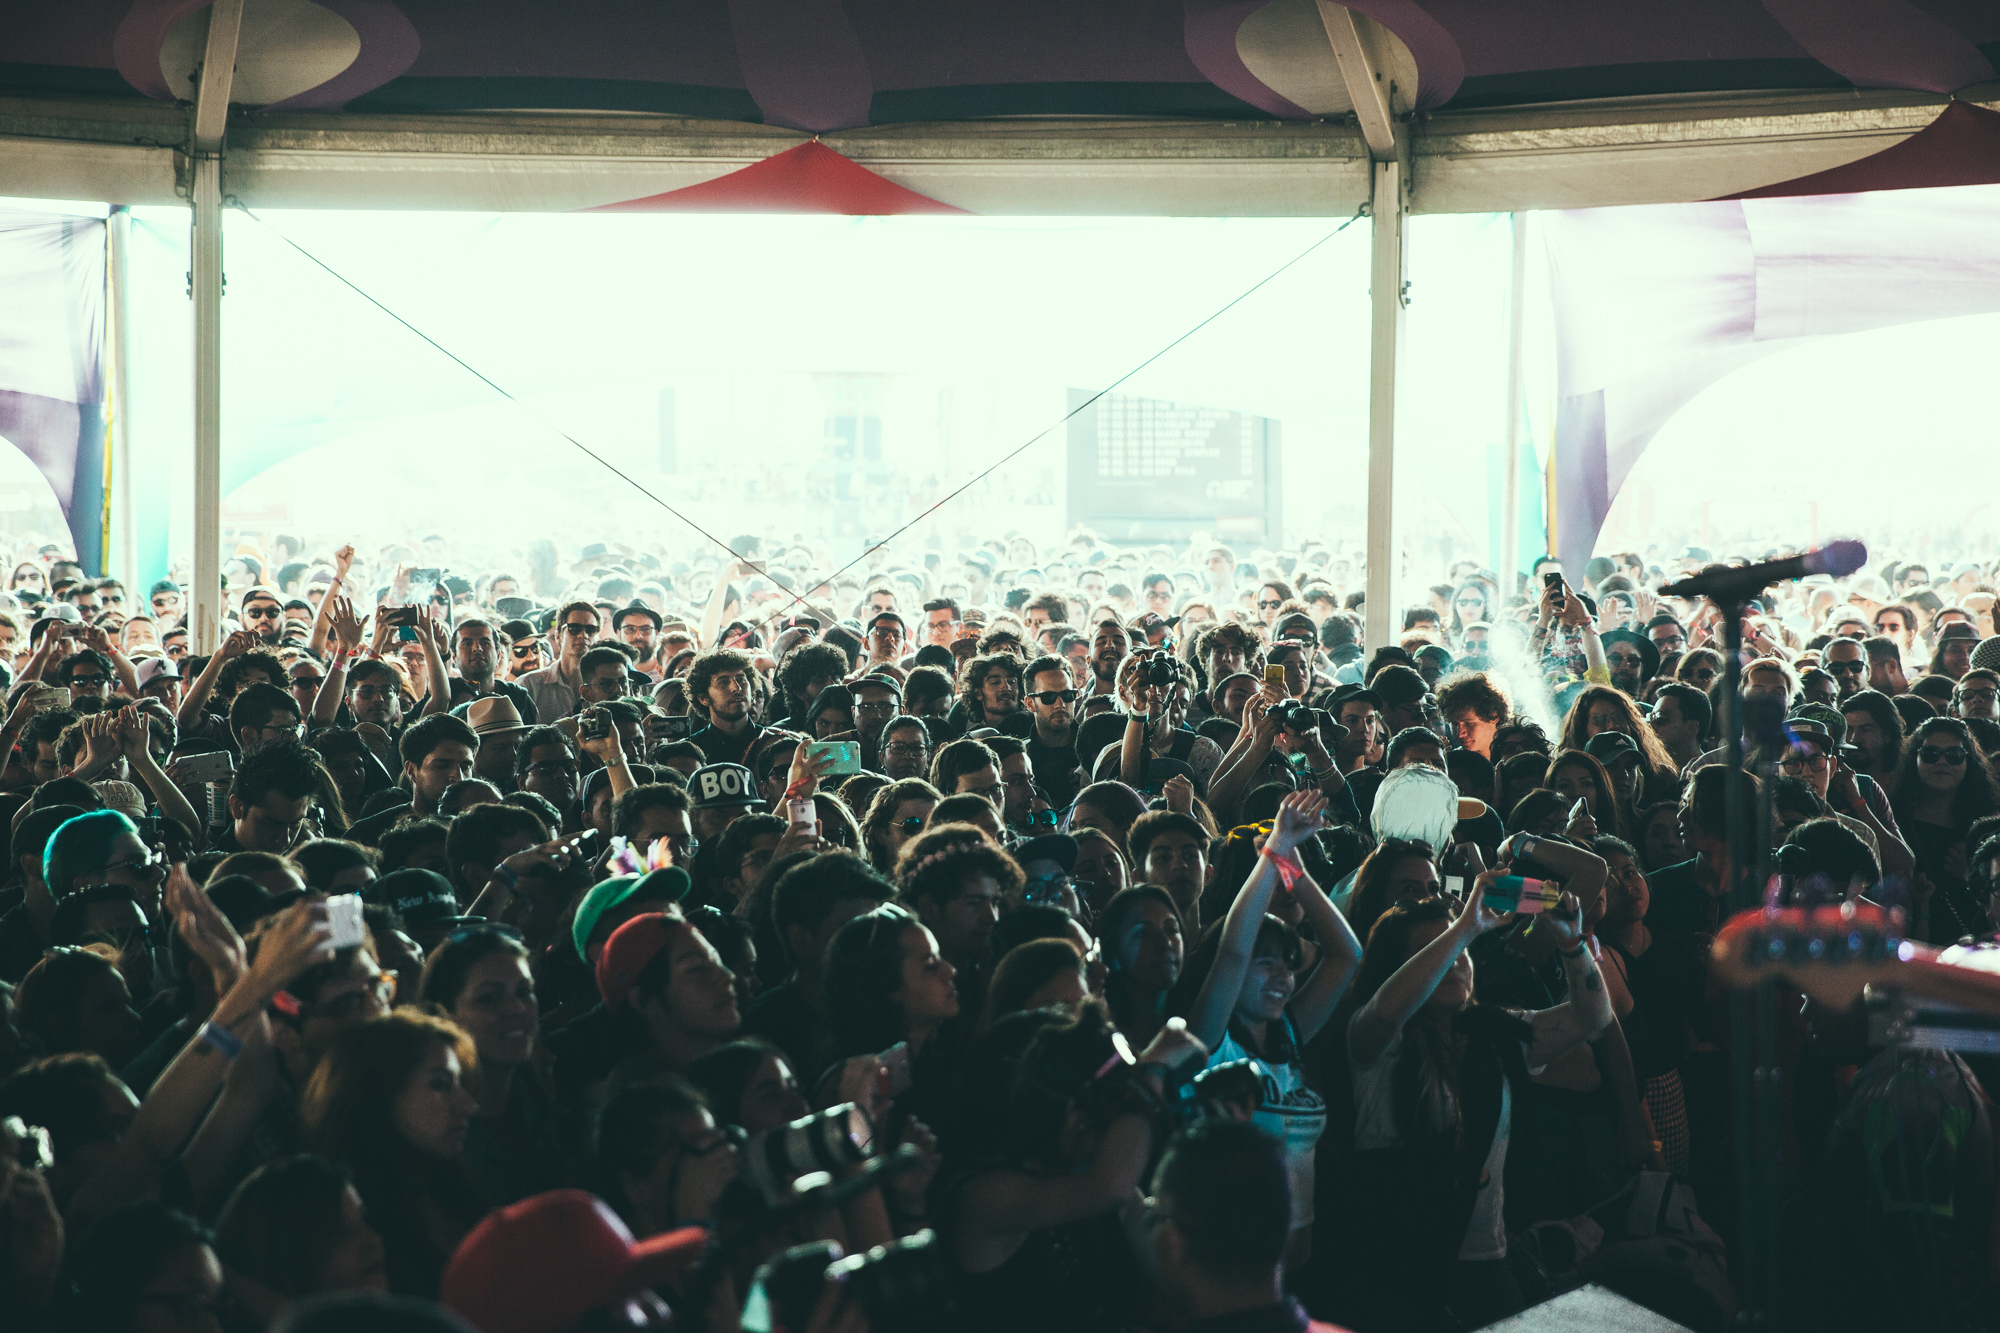 Crowd-Festival Ceremonia-Mexico-Foro Pegaso-04.02.2017-Daniel Patlan_Desde 1989 (13 of 49).jpg